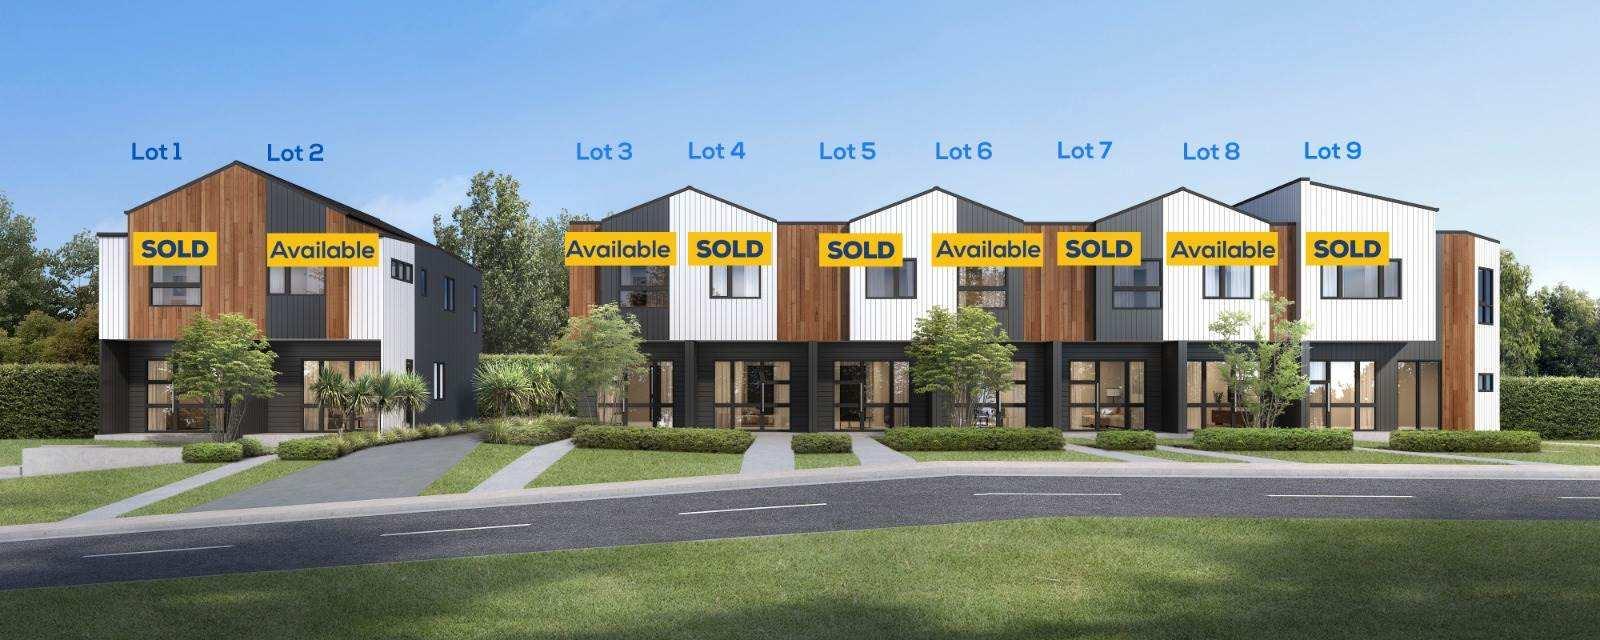 Henderson 2房 全新性价比靓宅 实力开发商打造 带10年建筑质保 配套一网打尽 未来升值可期! Stylish & Affordable Living - Only 4 more left!